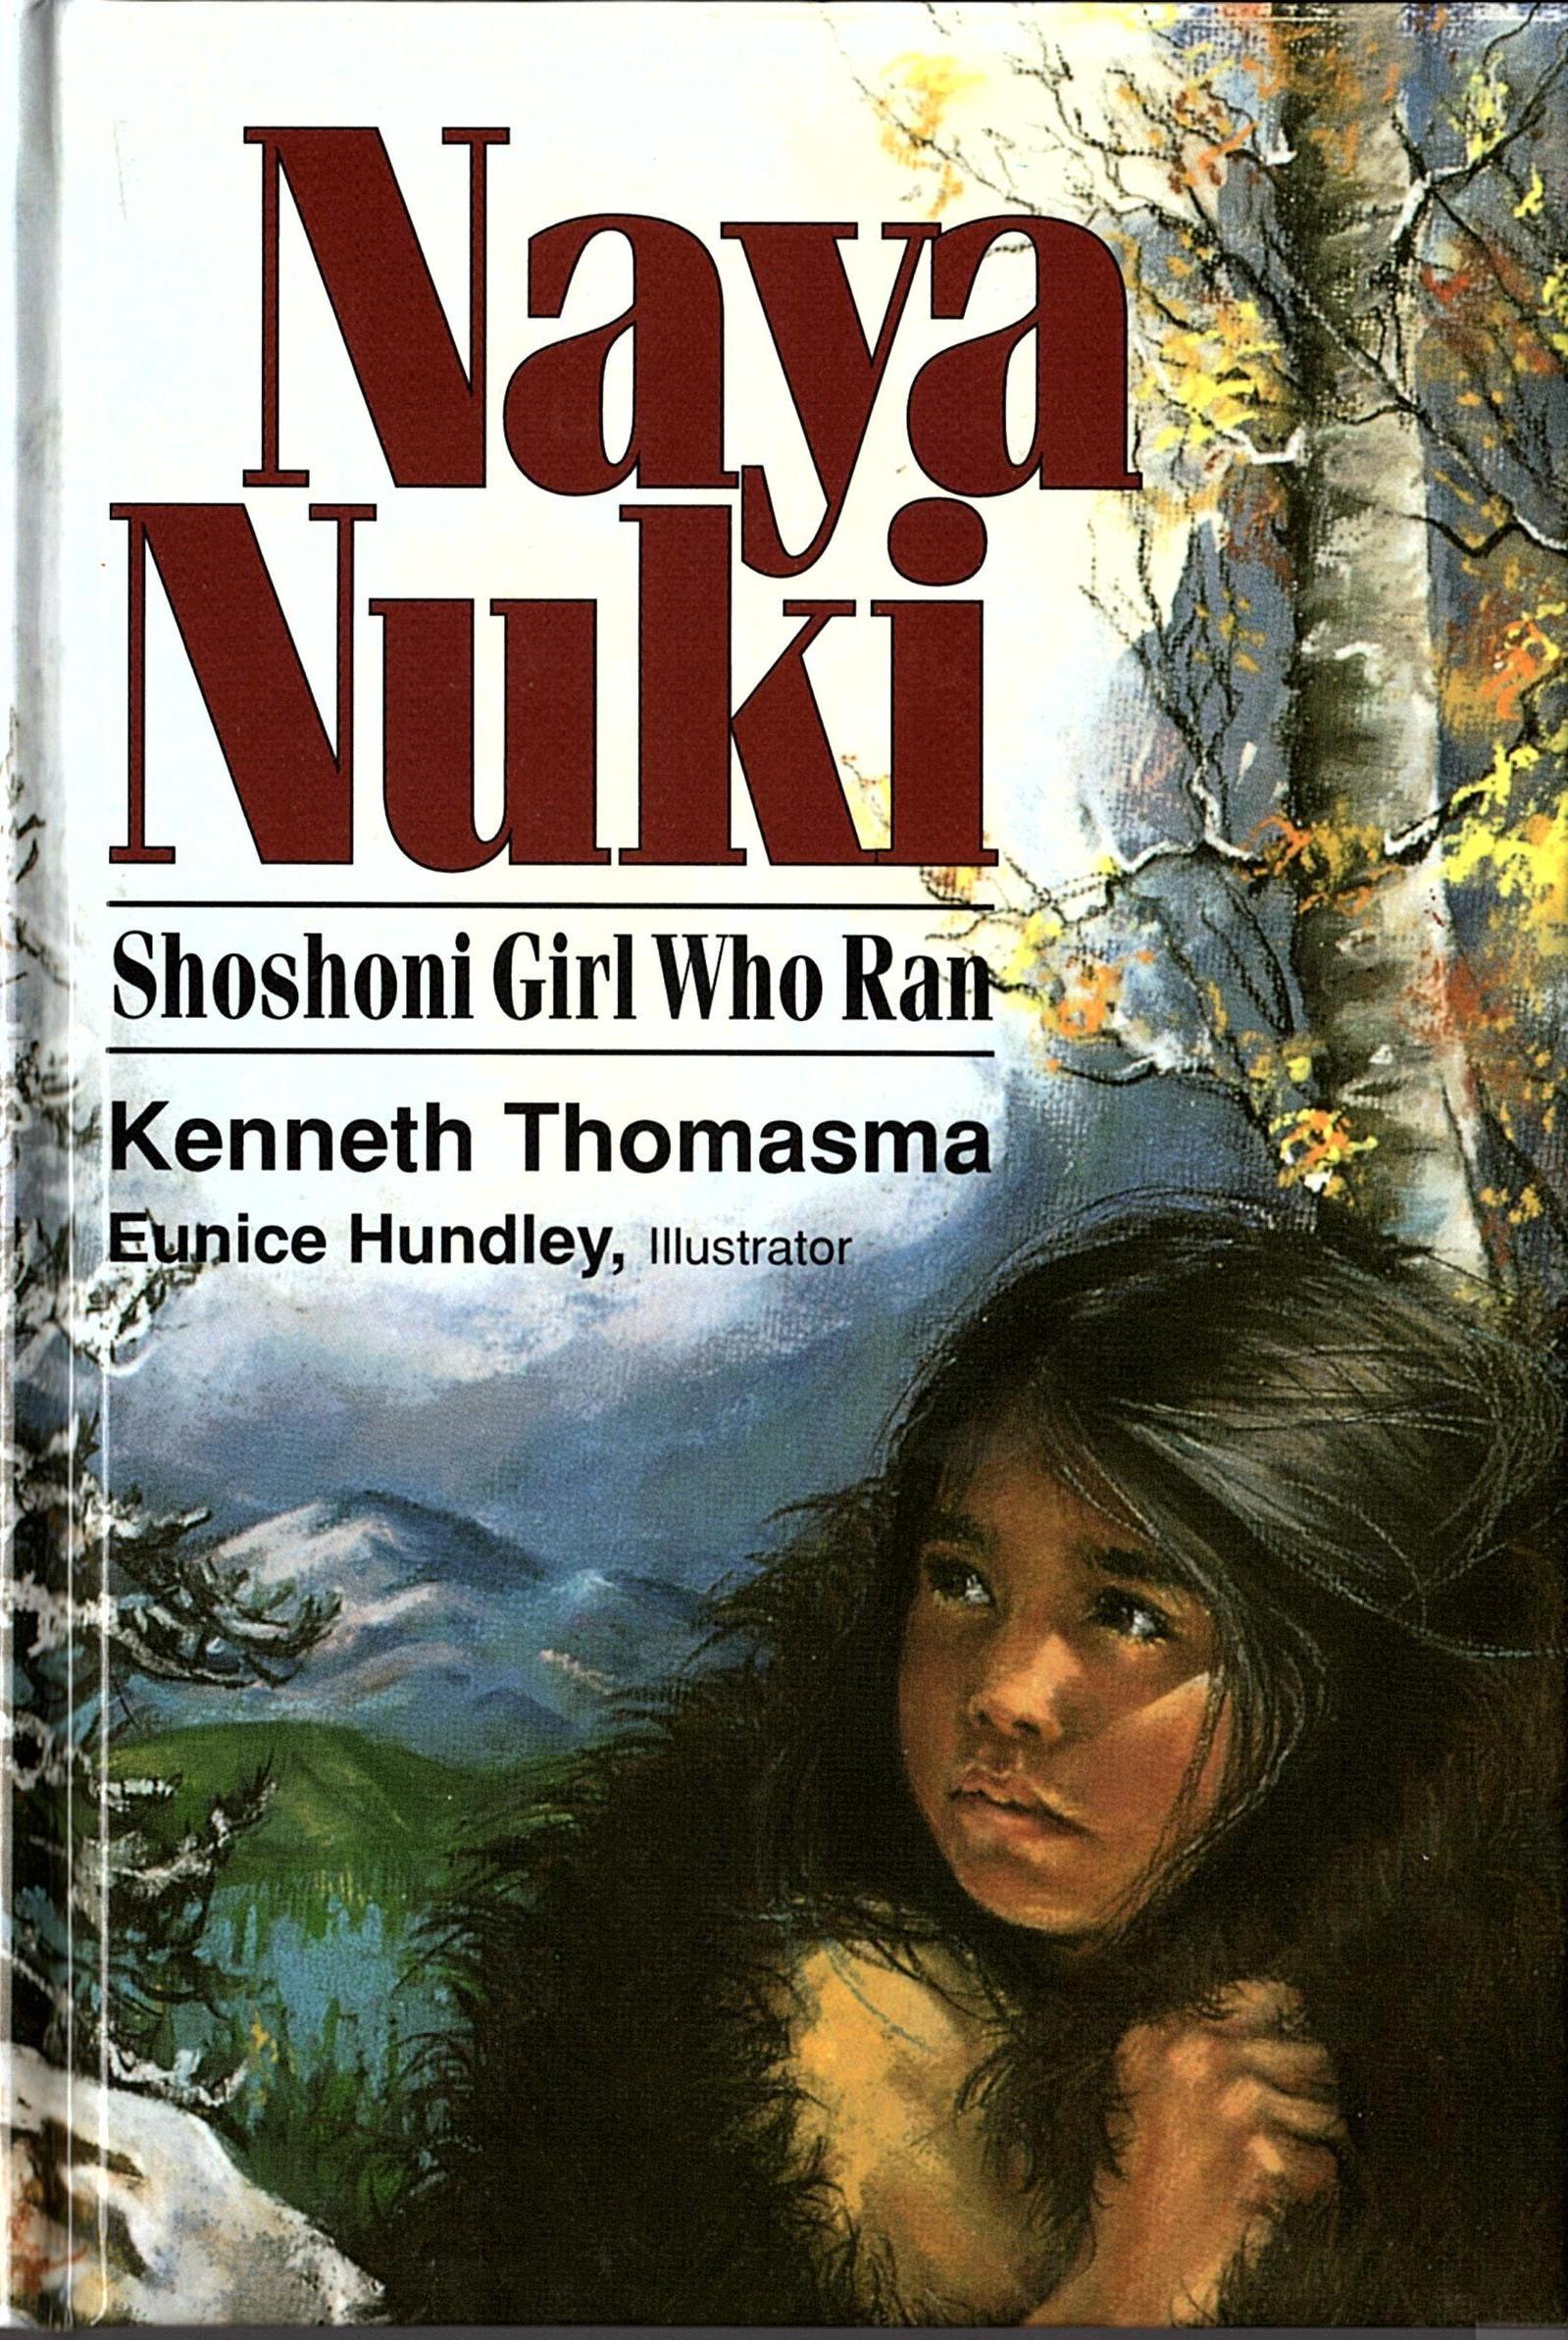 TBR Naya Nuki